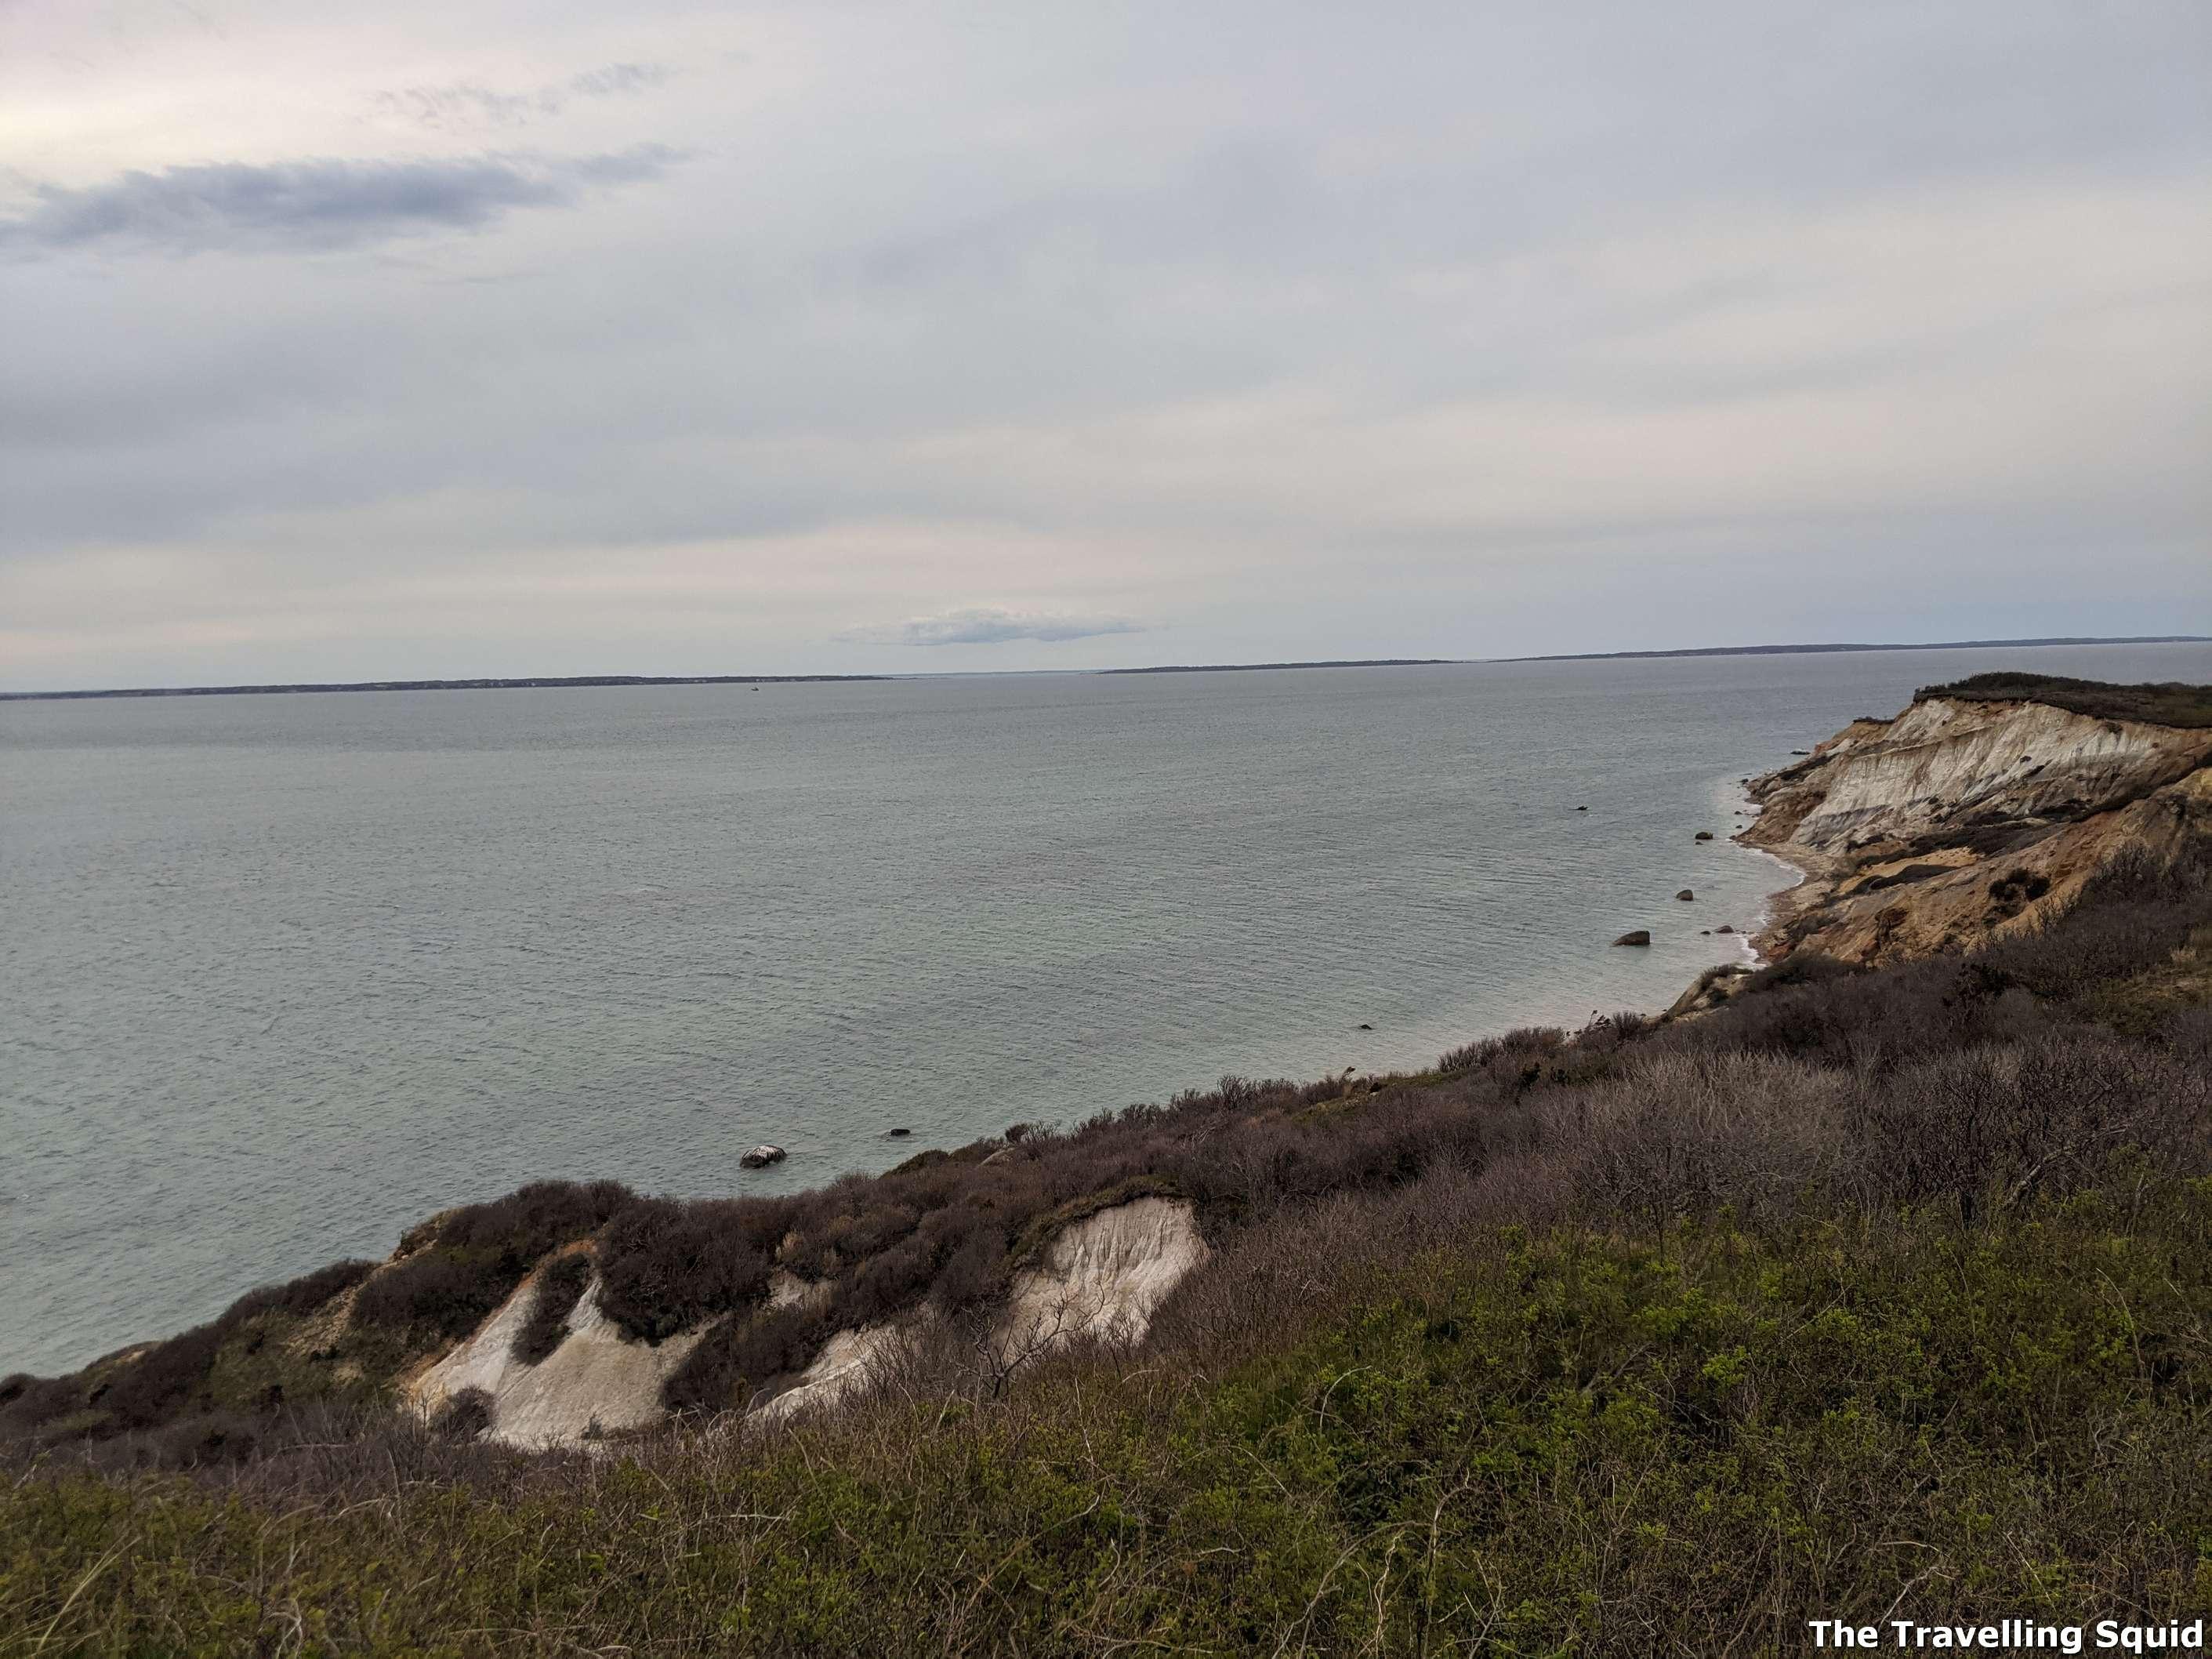 Aquinnah Cliffs Overlook Marthas Vineyard